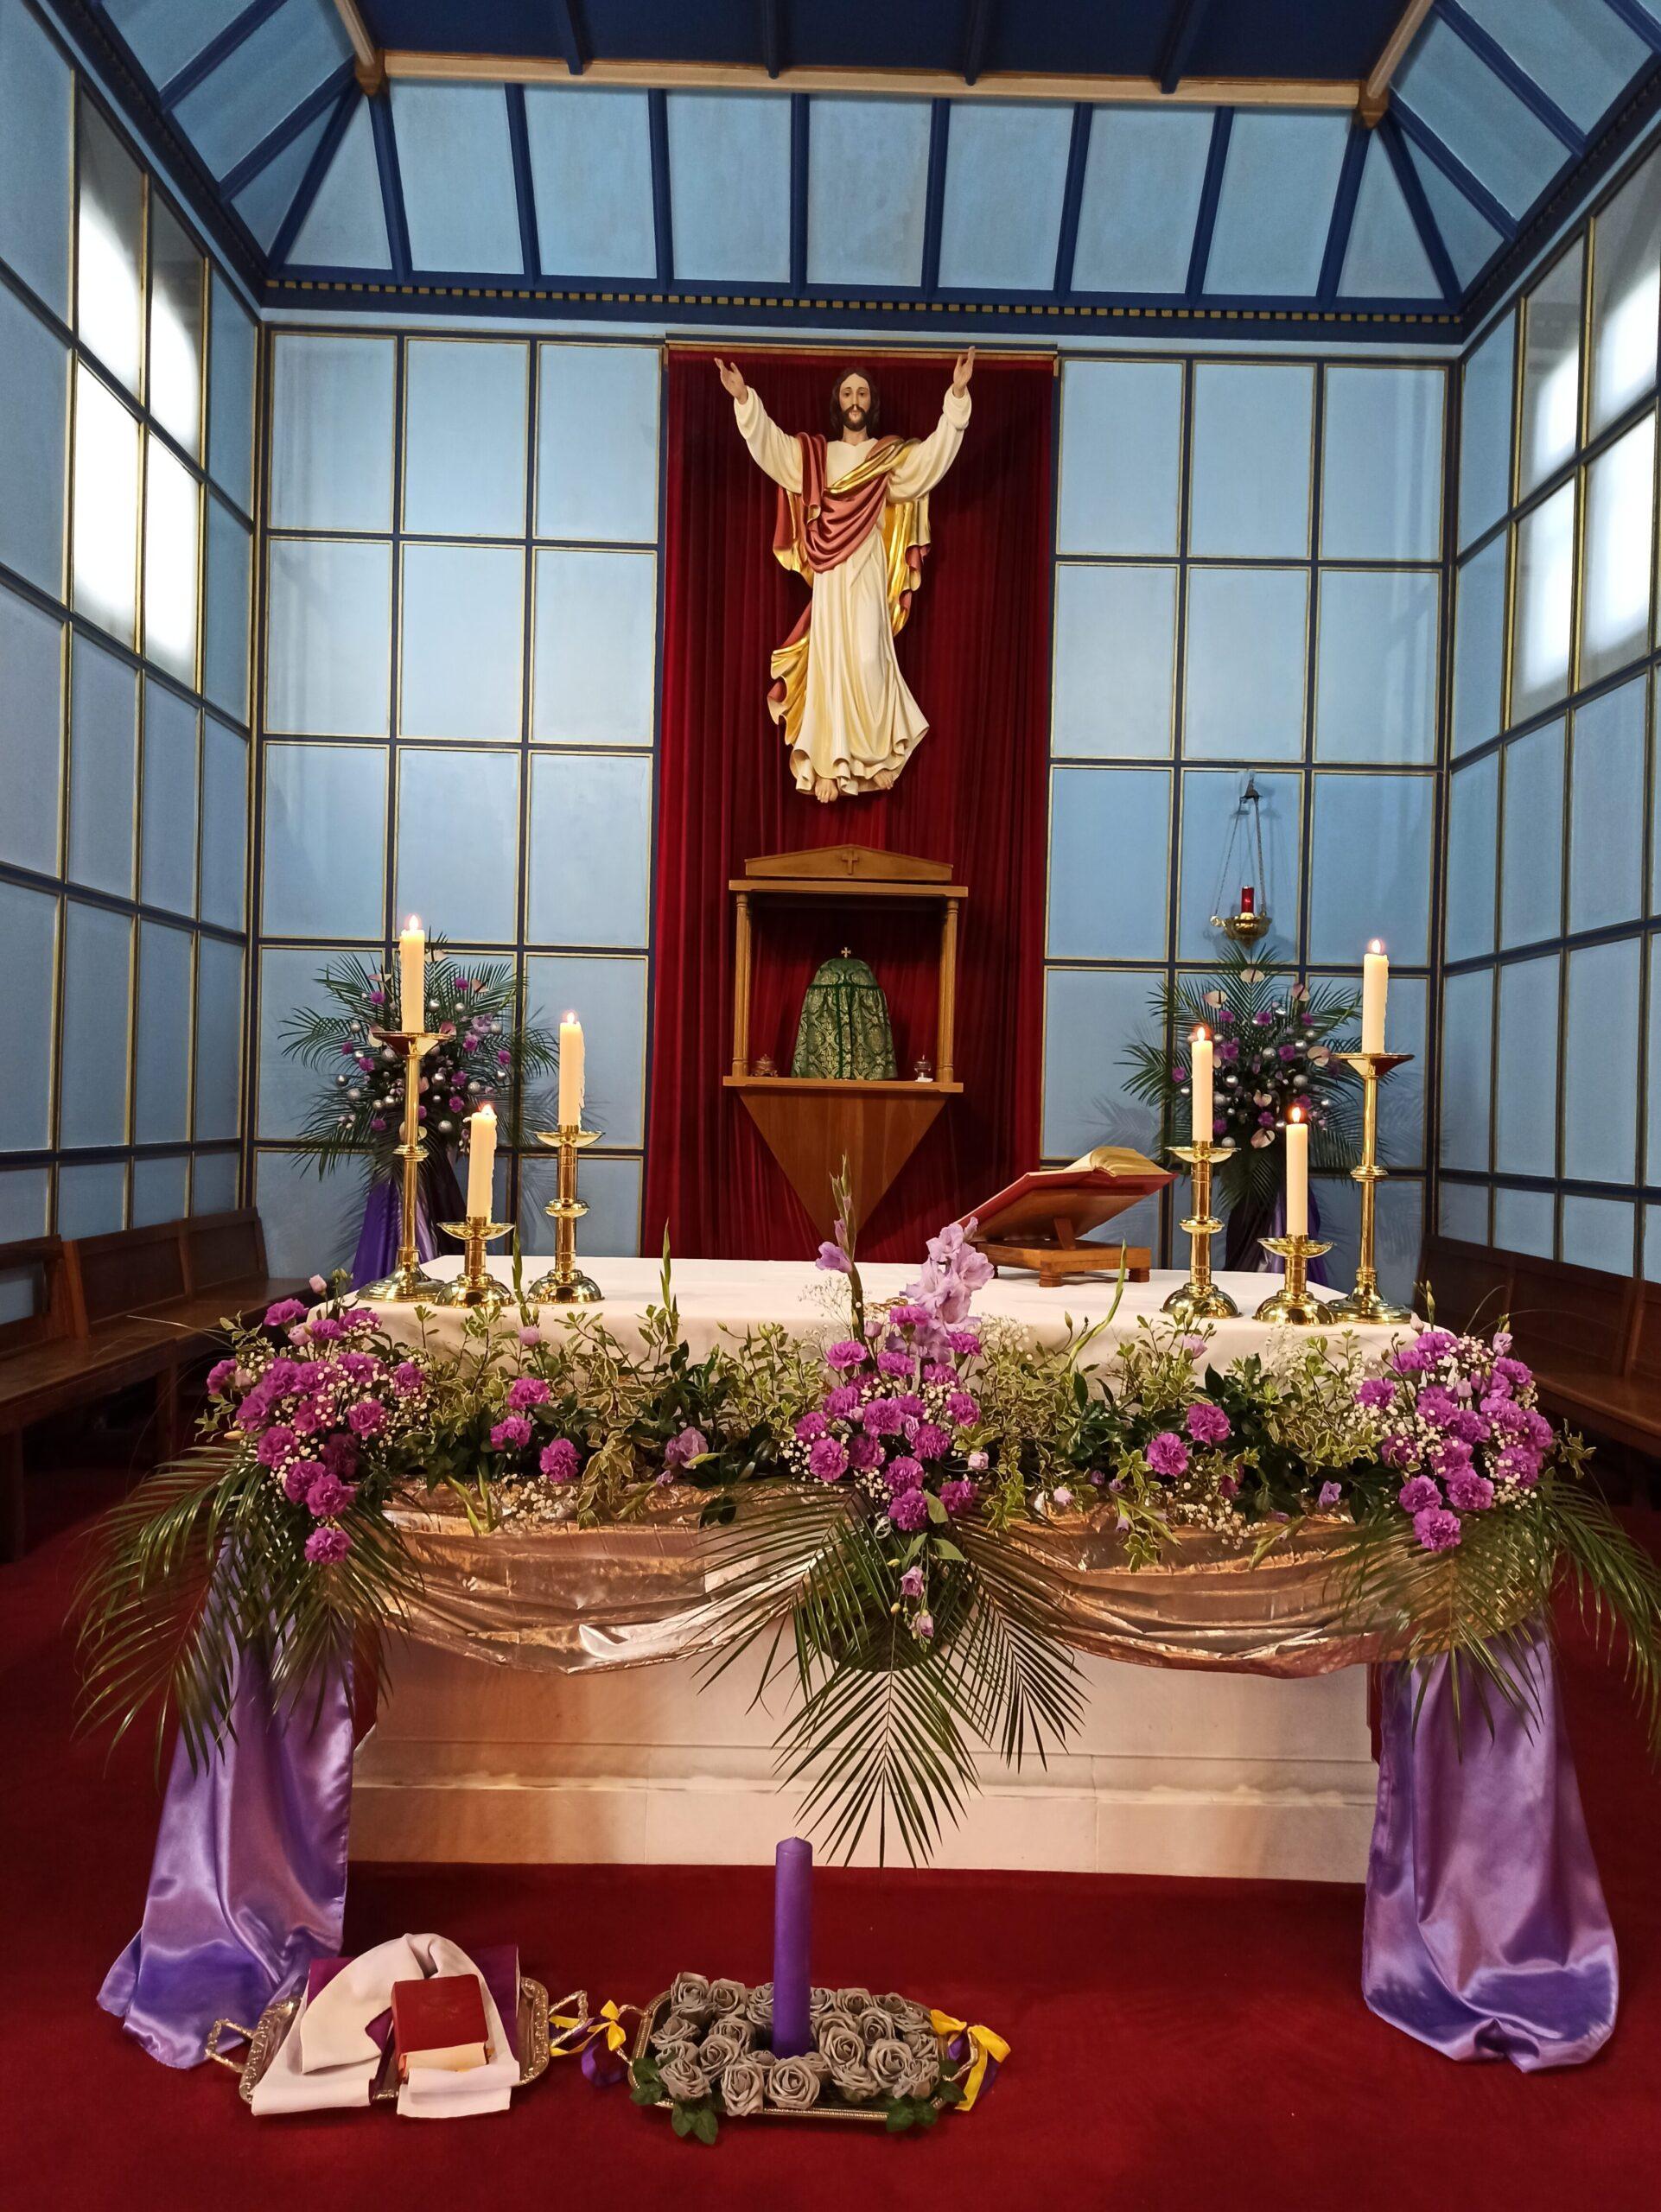 Fr Oliver 25th anniversary celebrations